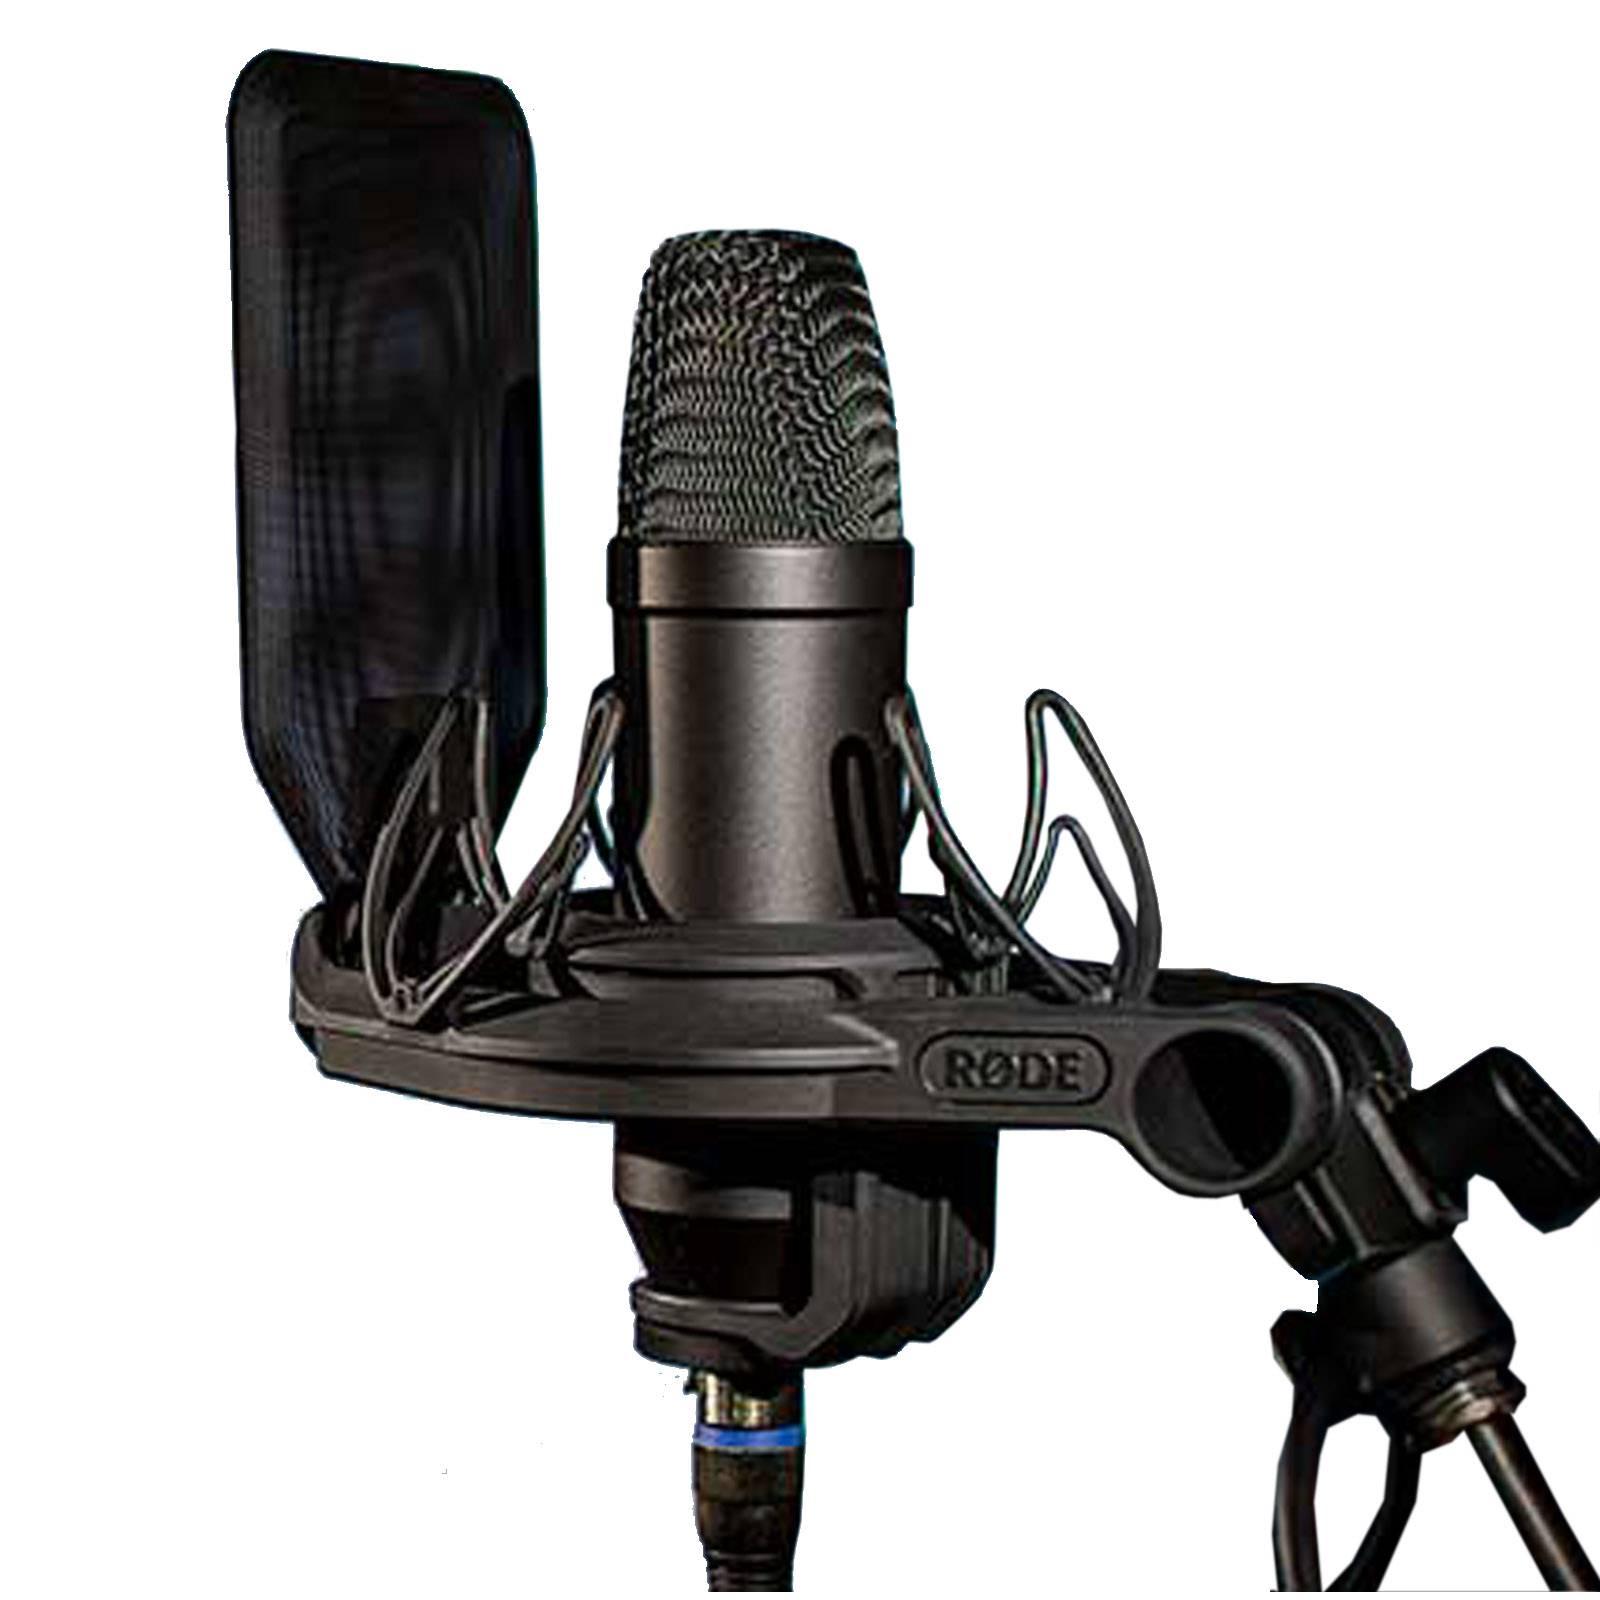 Rode Nt1 Microphone : rode nt1 condenser microphone kit shockmount and popshield studio recording from inta audio uk ~ Hamham.info Haus und Dekorationen